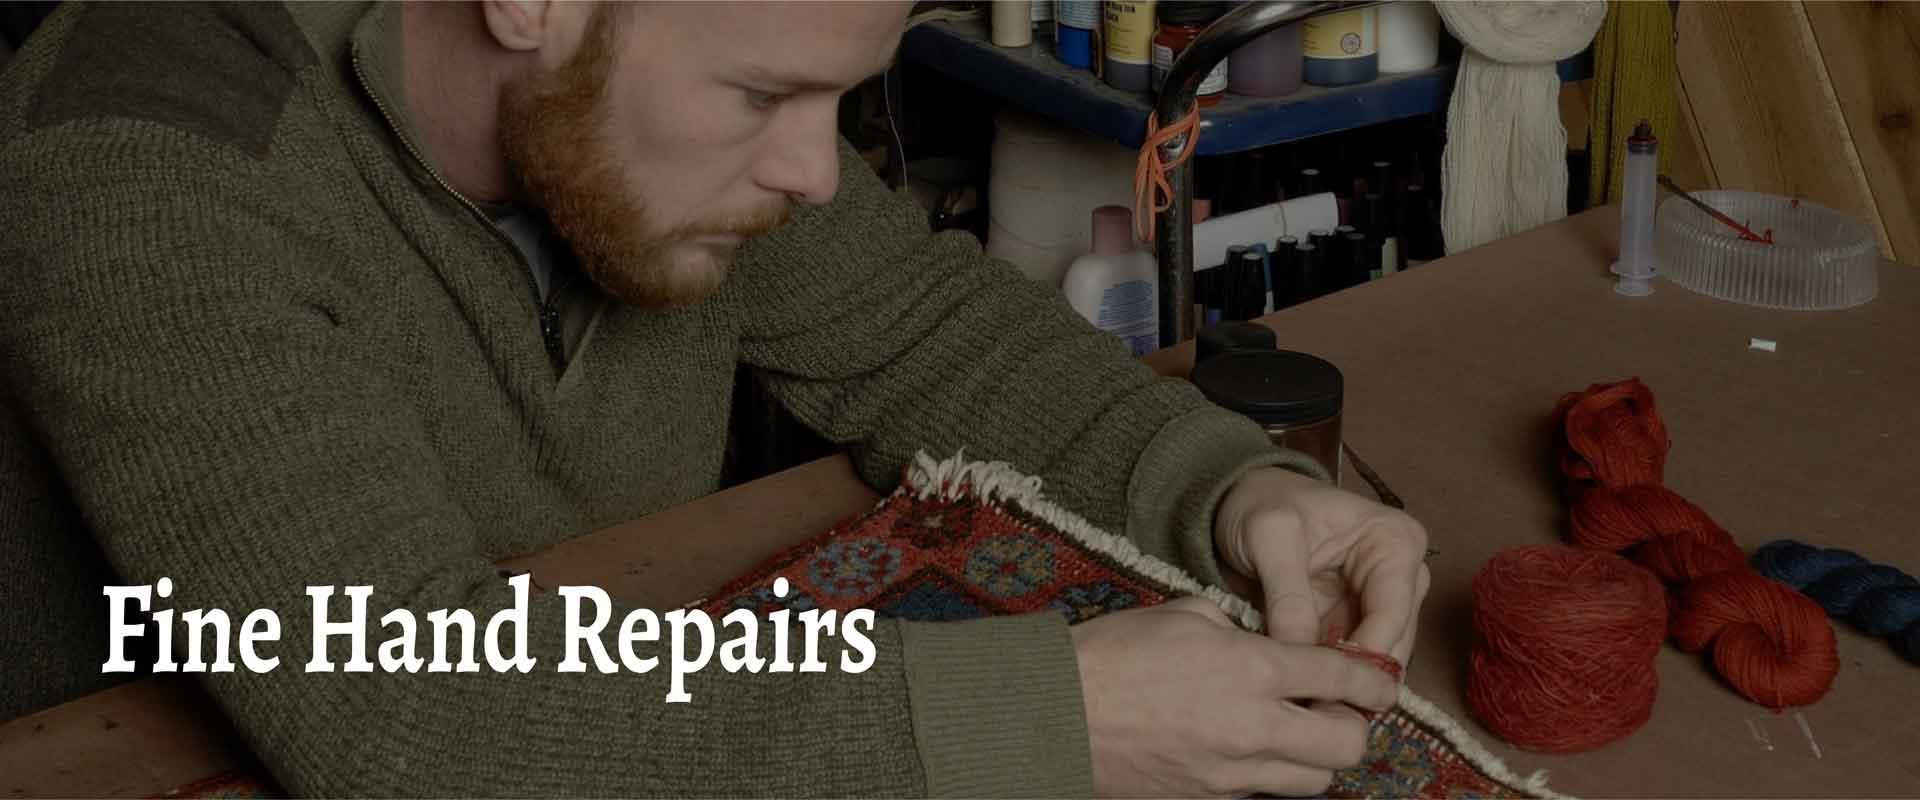 hand-repairs-large